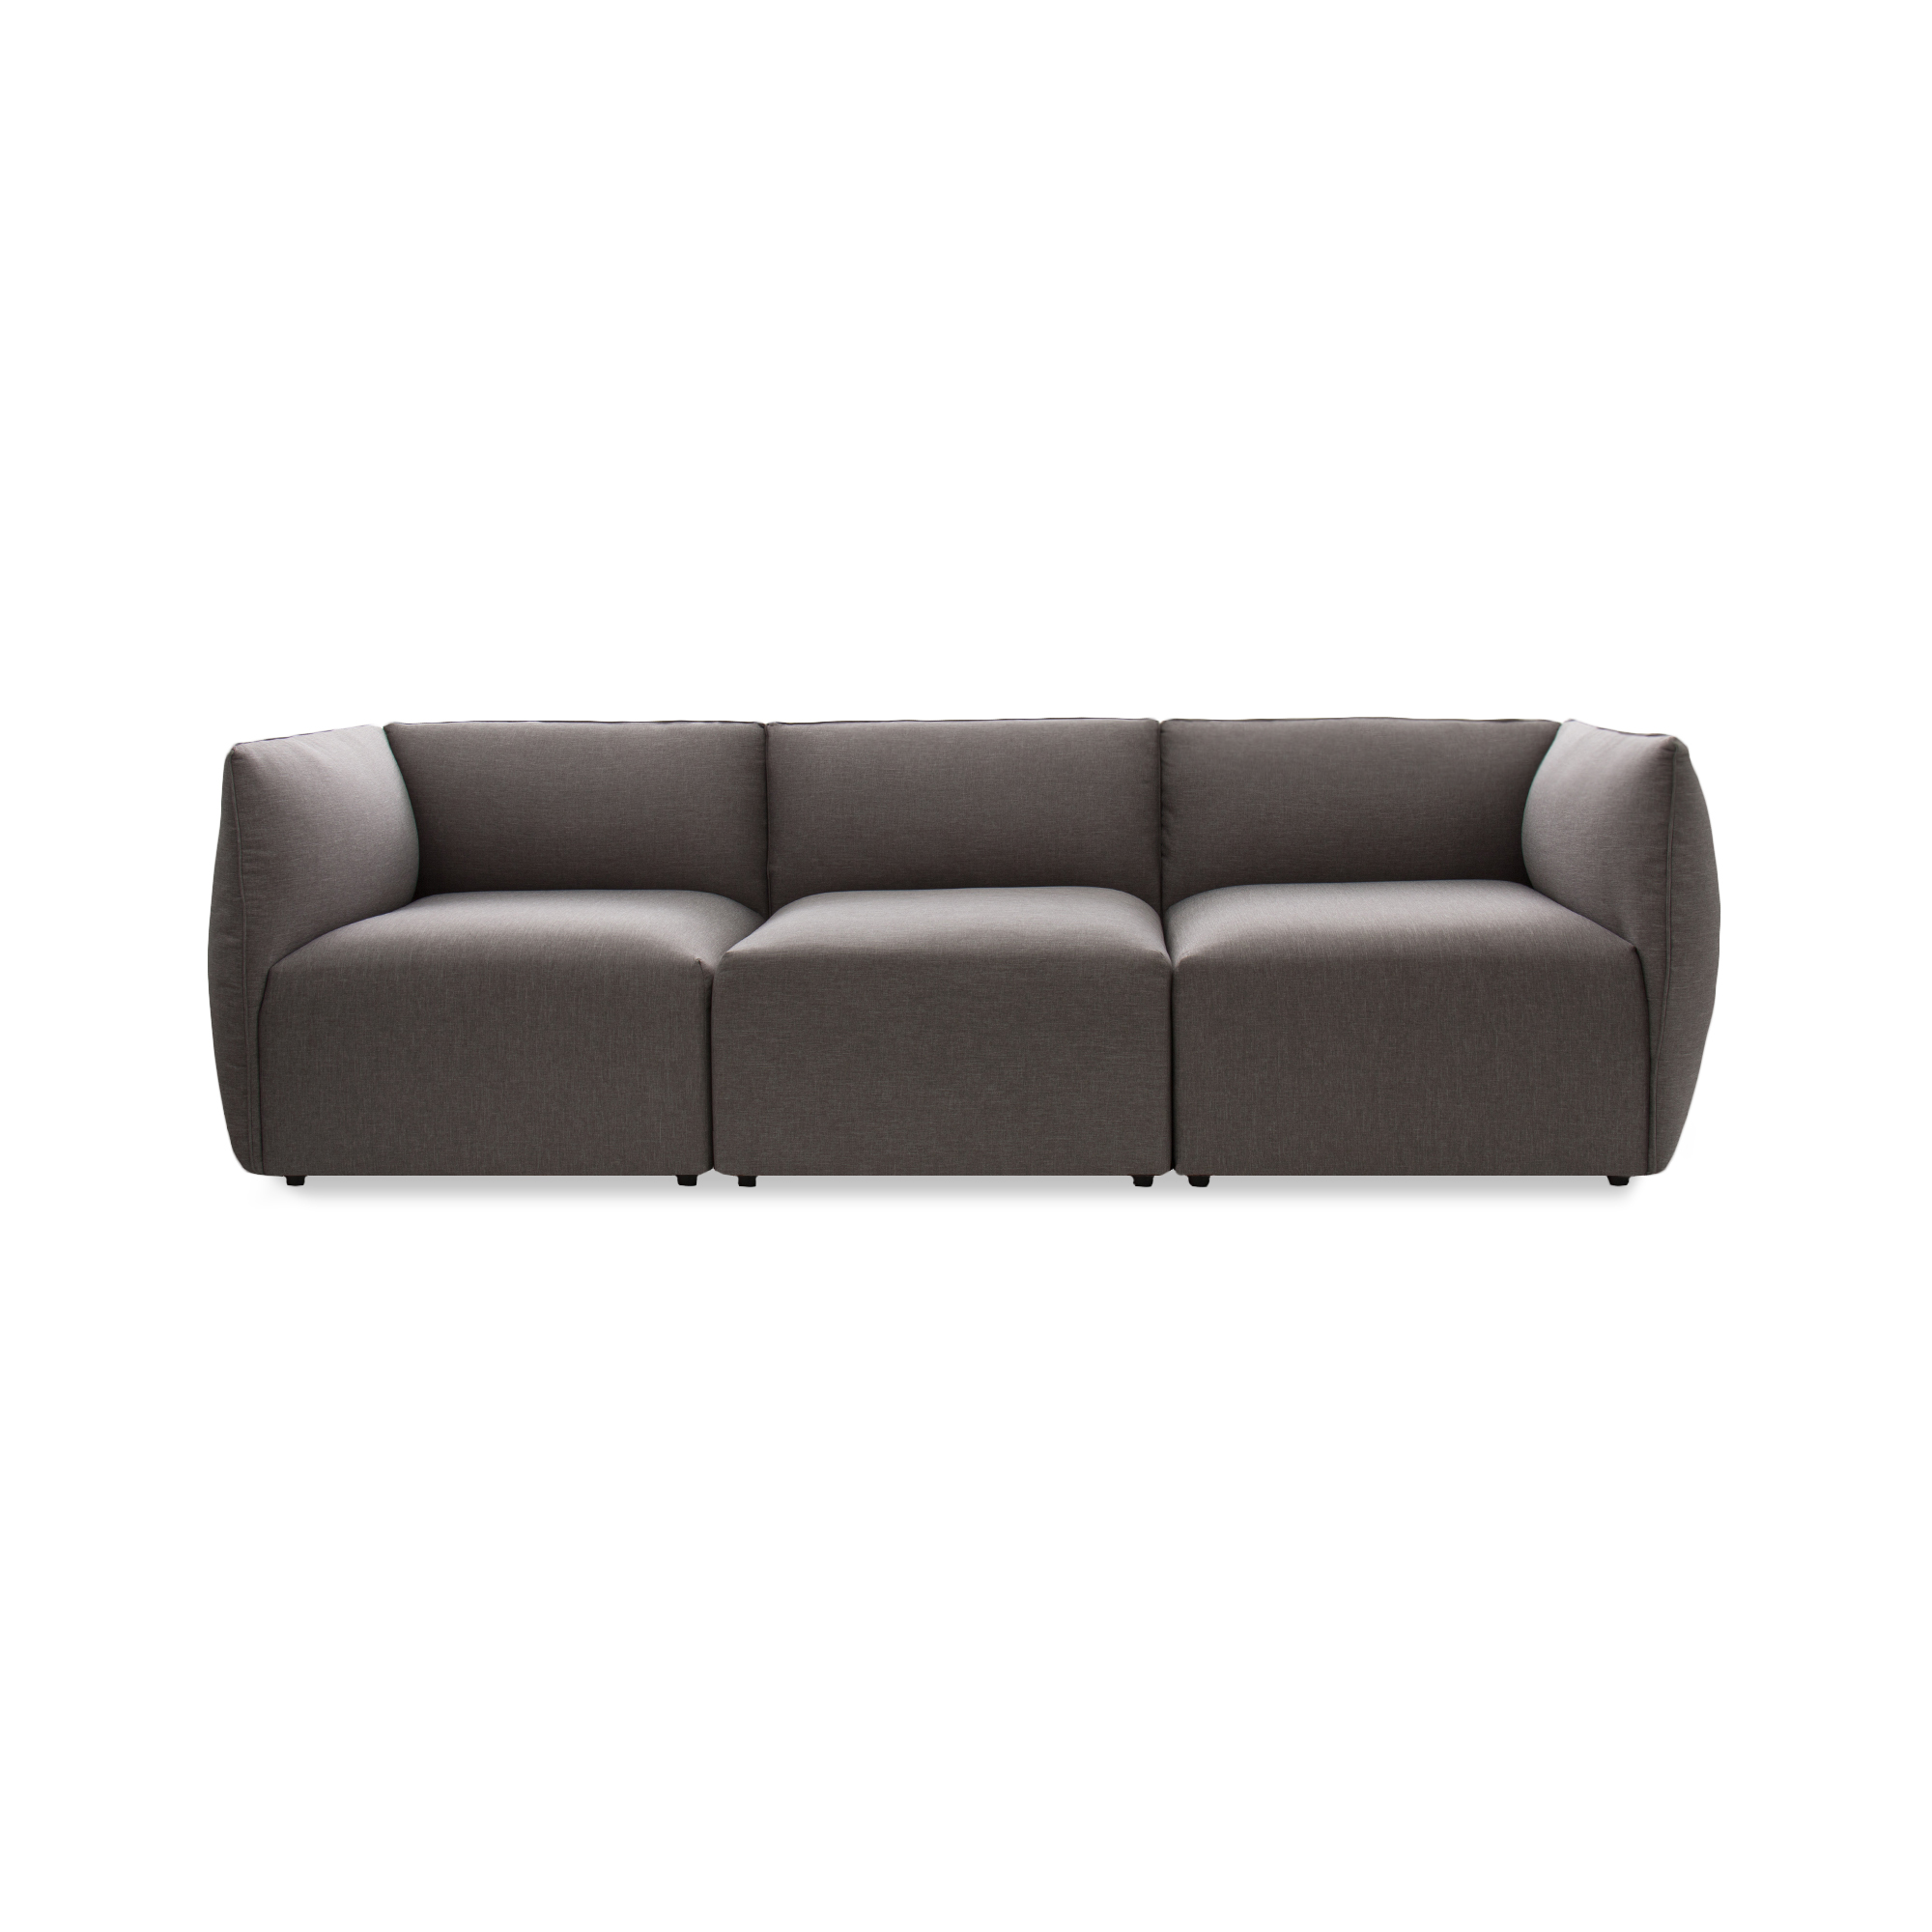 Canapea Fixa 3 locuri Cube Light Grey